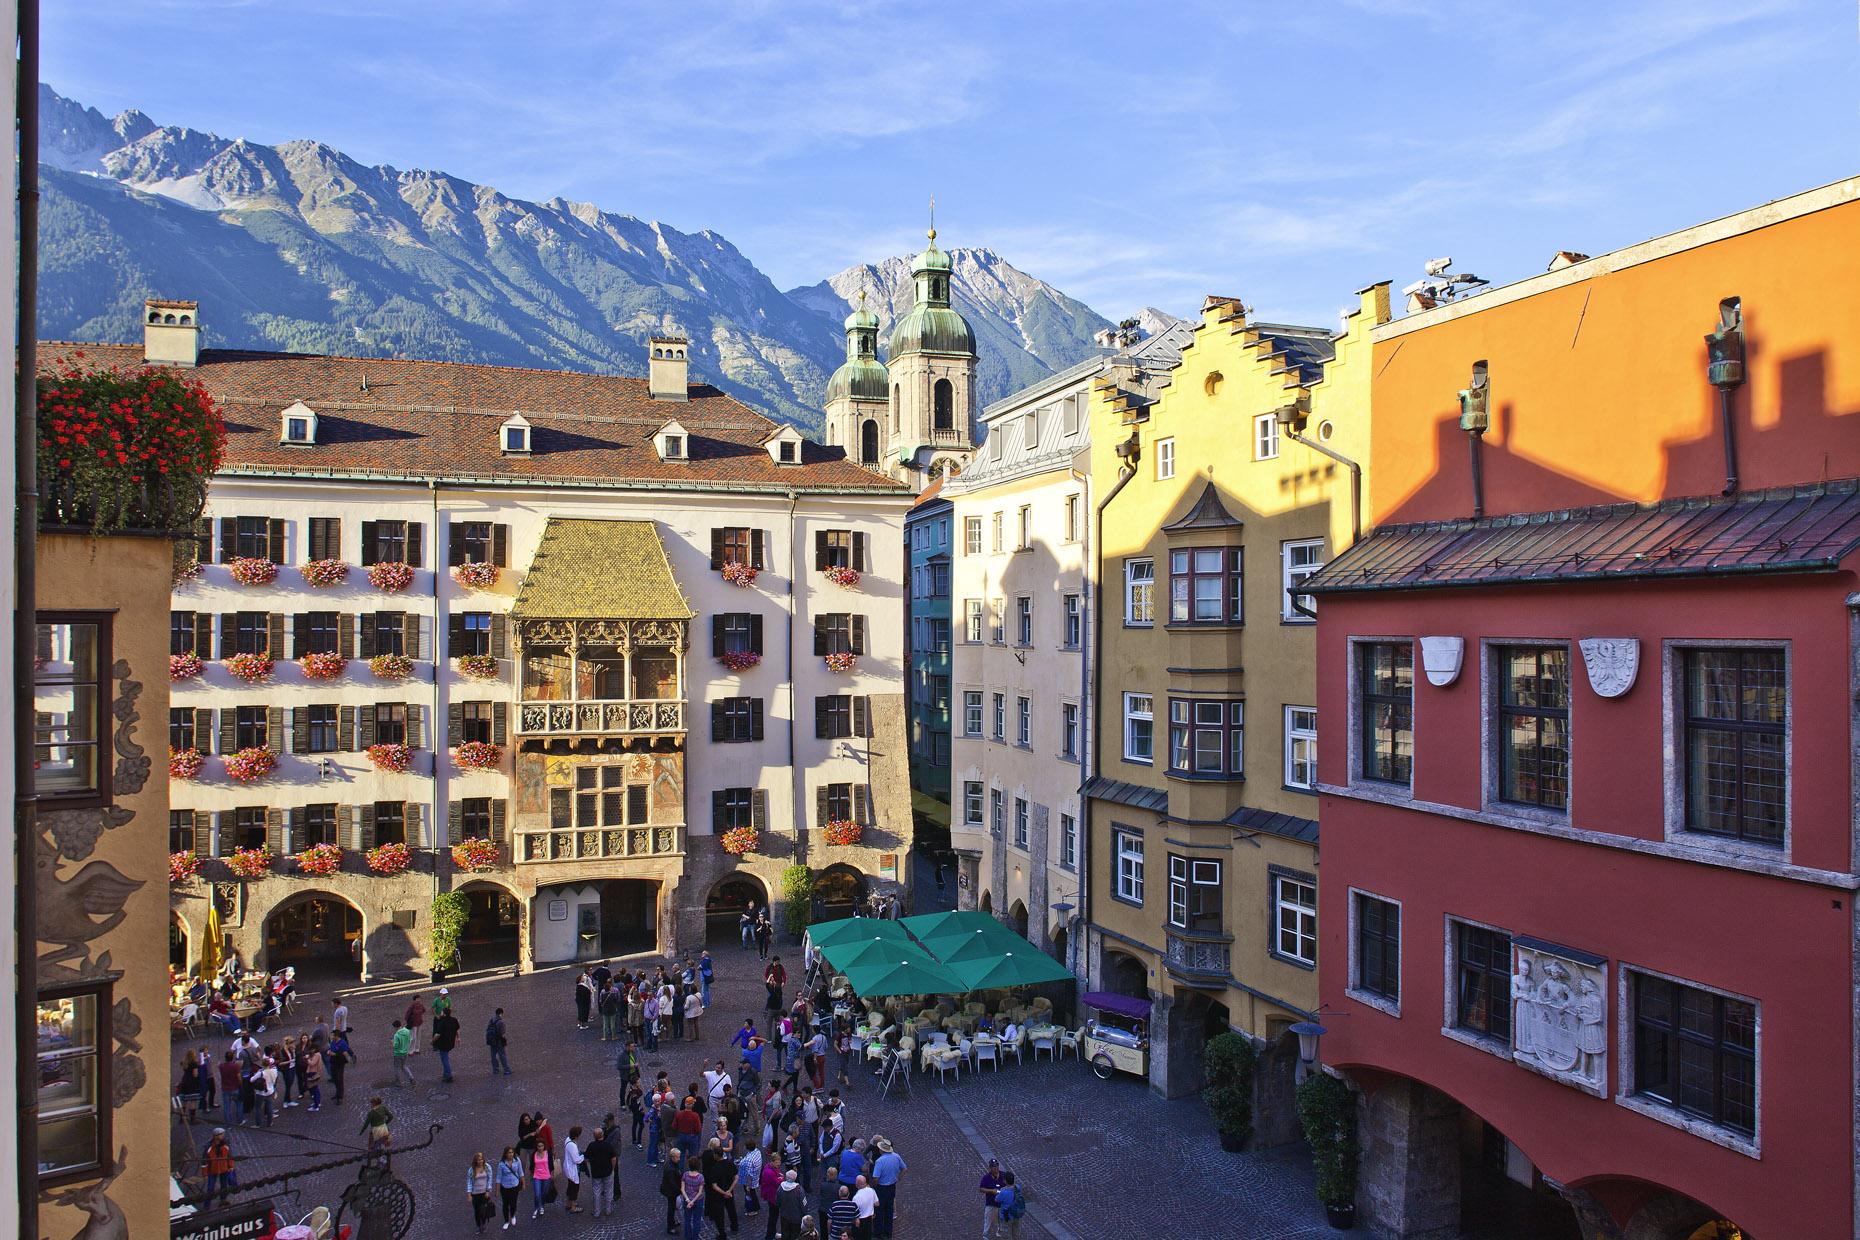 Guide to Innsbruck road cycling holidays Best biking city break Copyright of Innsbruck Tourism Photo by Christof Lackner